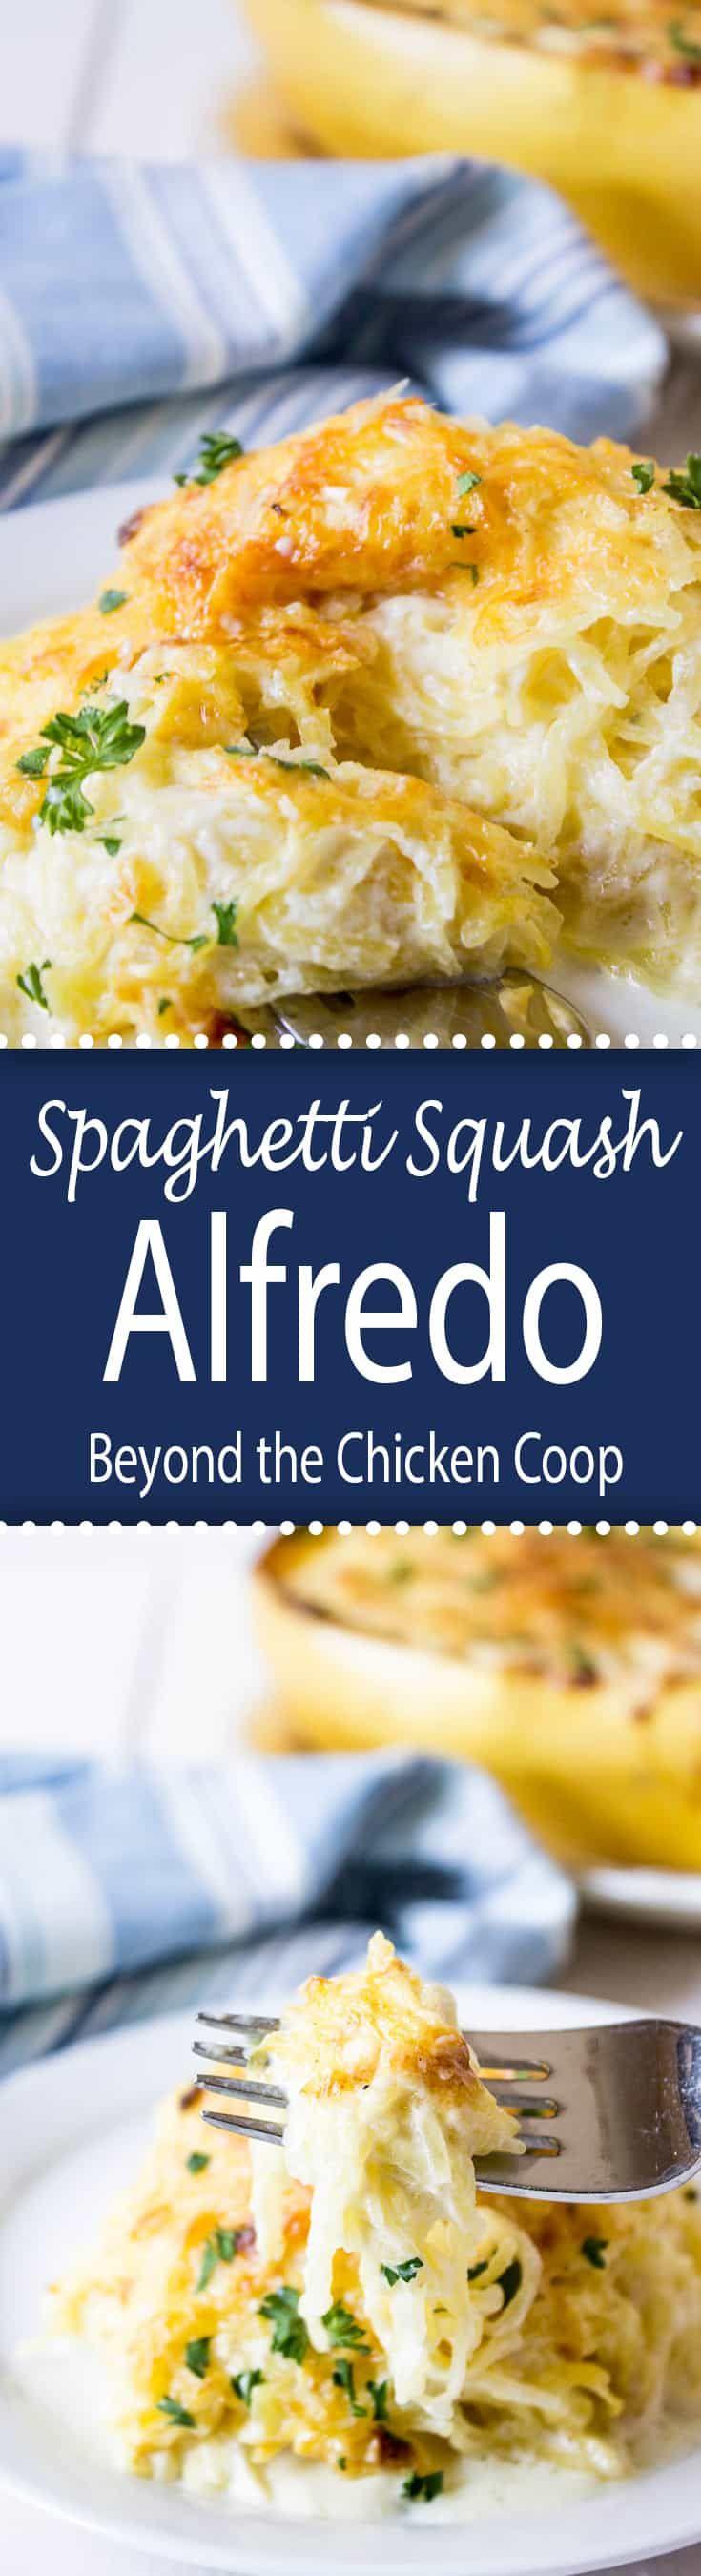 Spaghetti Squash Alfredo is cheesy and delicious.  #spaghettisquash #Alfredo #cheesybakedsquash #bakedspaghettisquash  via @Beyondthecoop